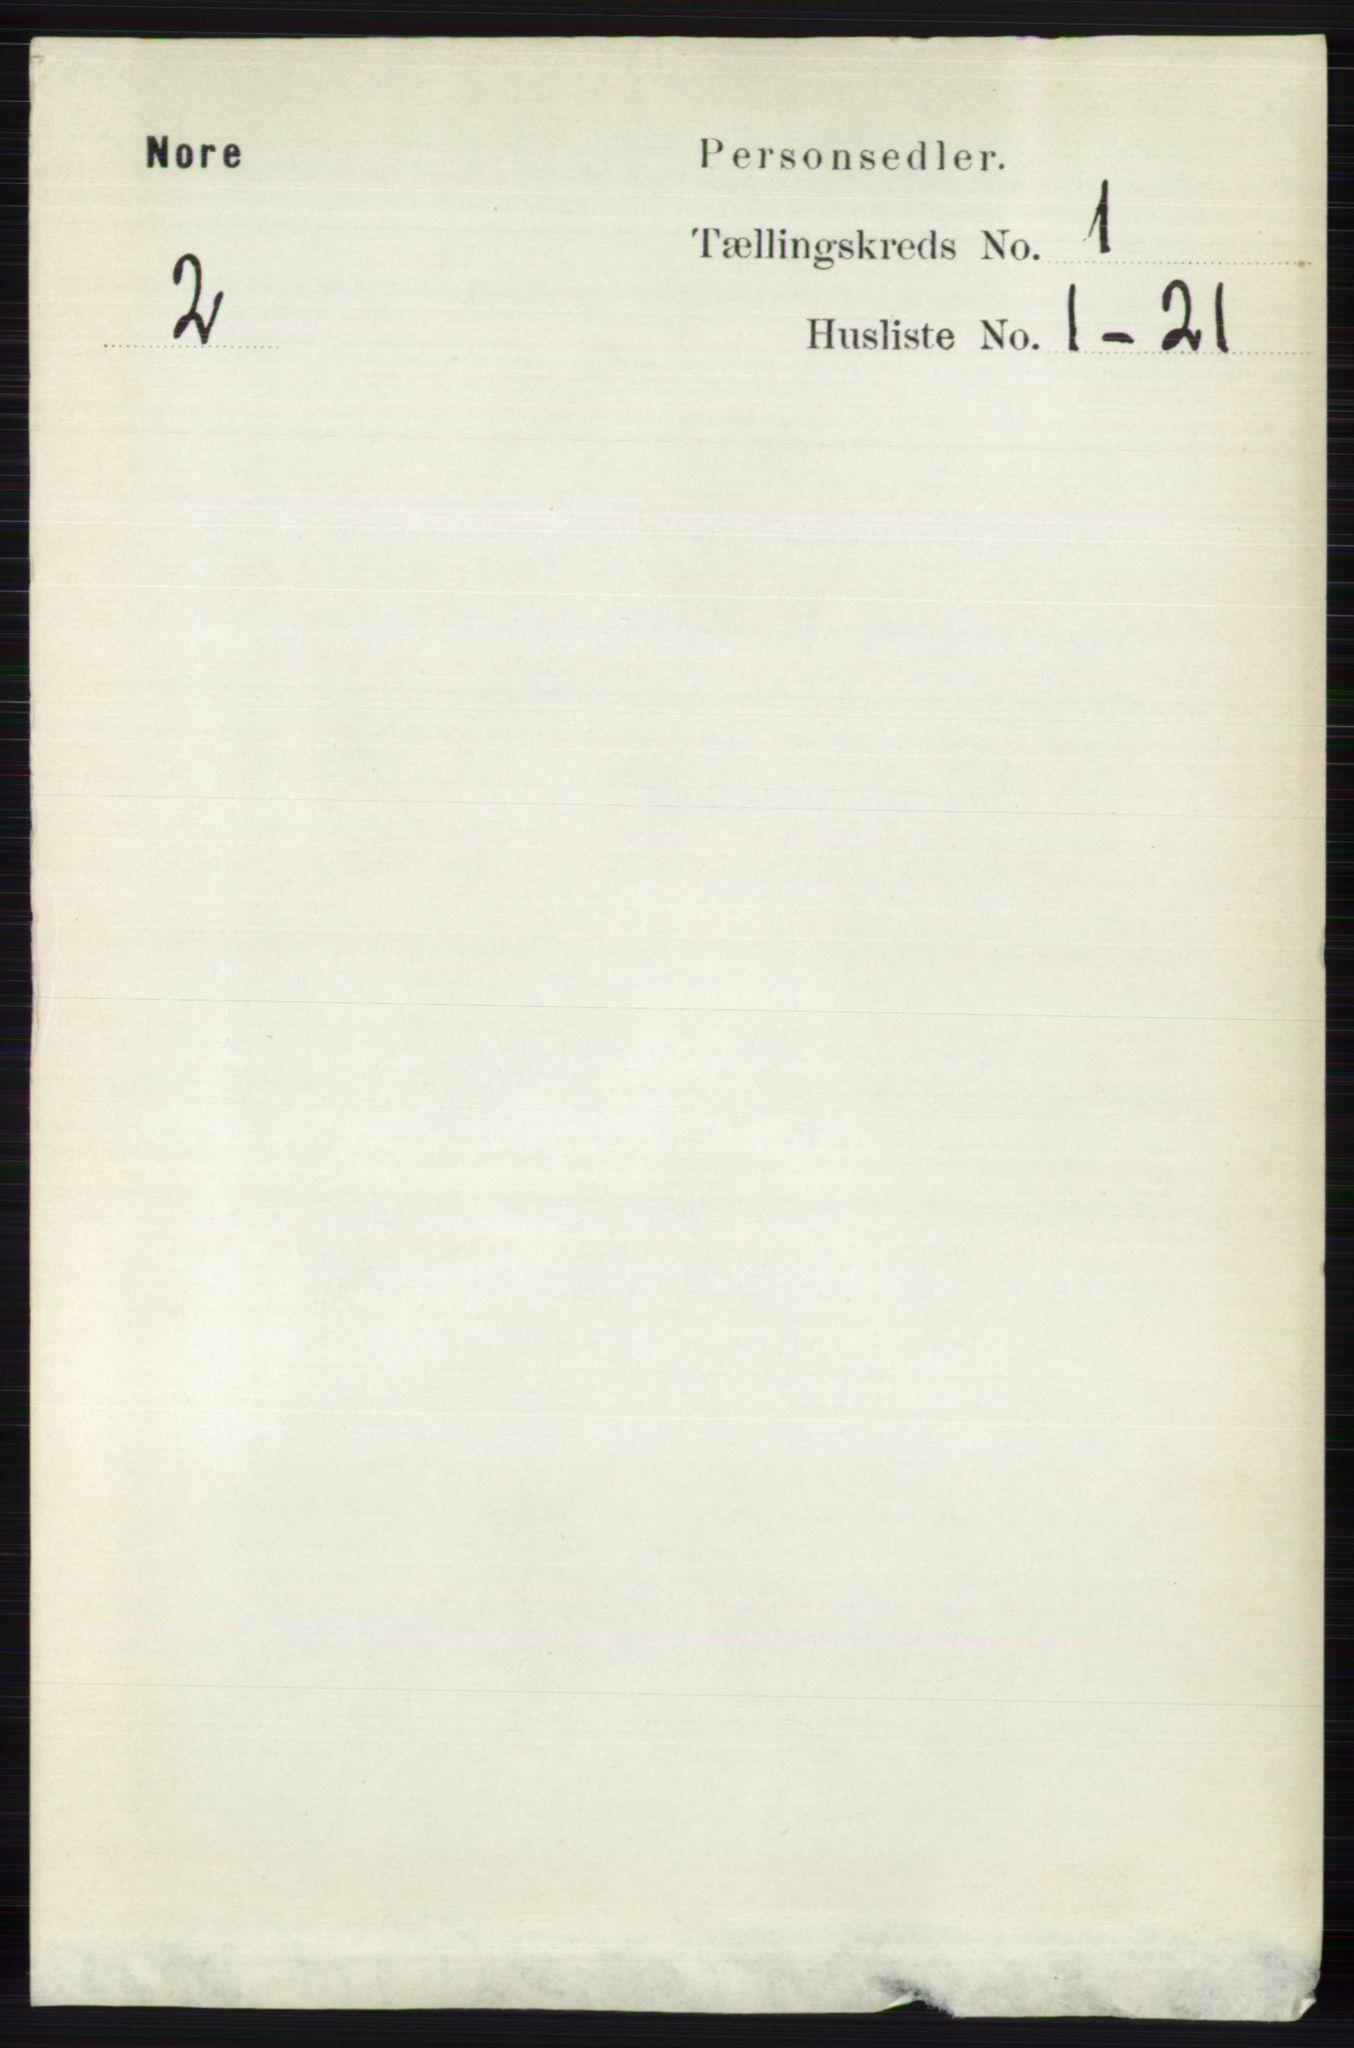 RA, Folketelling 1891 for 0633 Nore herred, 1891, s. 59